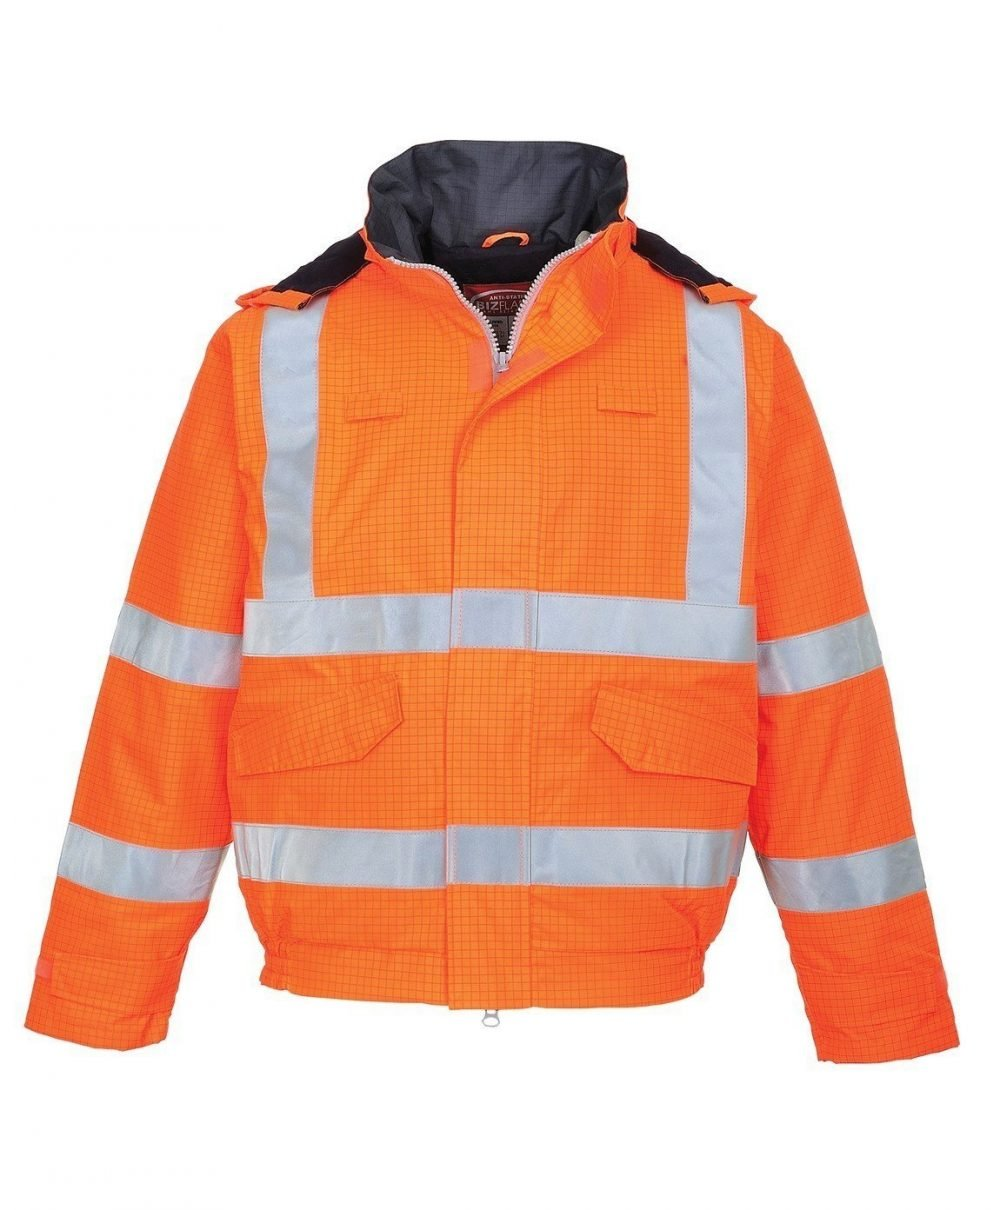 PPG Workwear Portwest Bizflame Rain FR Lined Bomber Jacket S773 Orange Colour